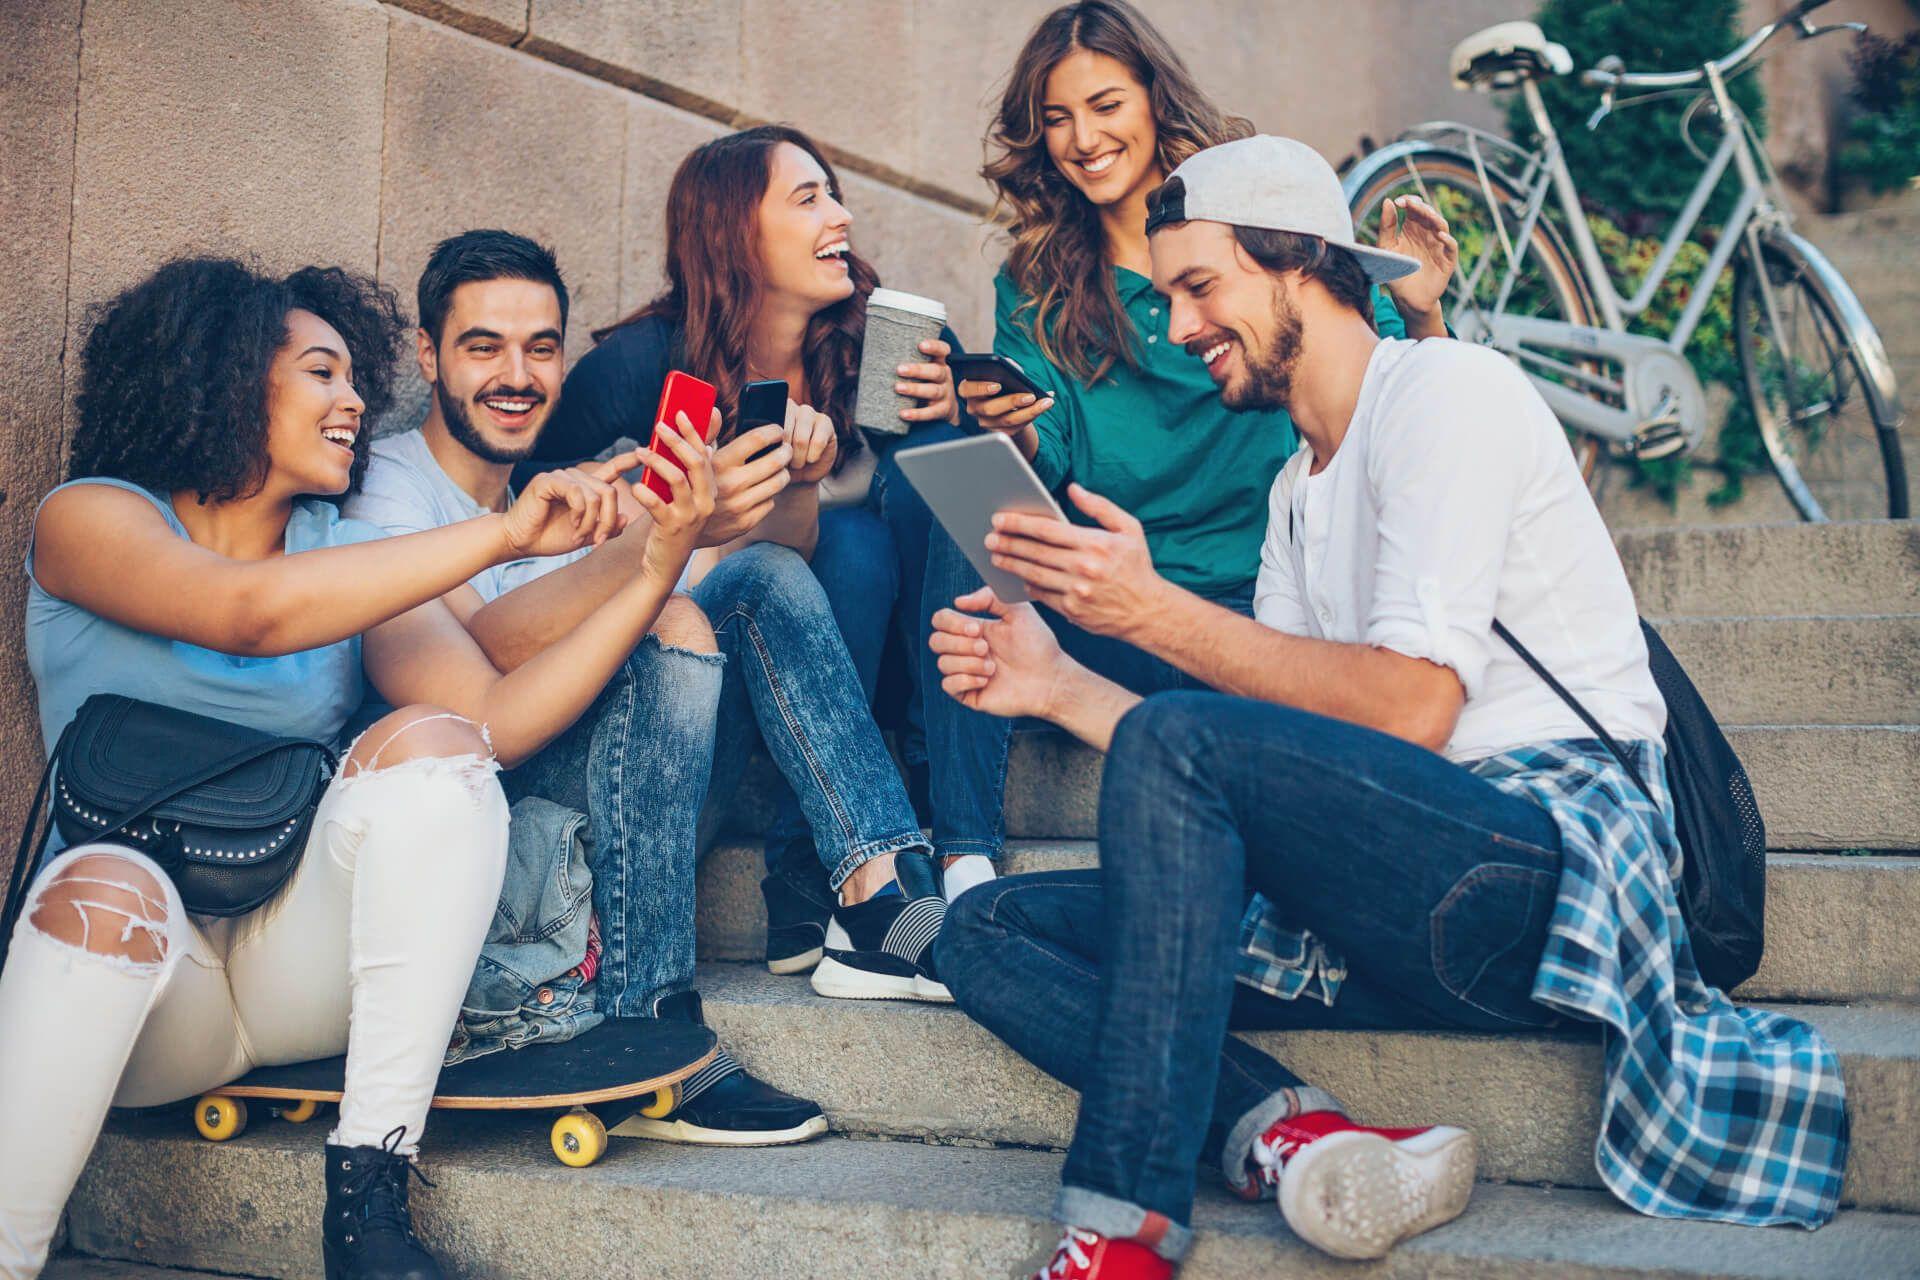 6 Aussie fintechs disrupting how we transact